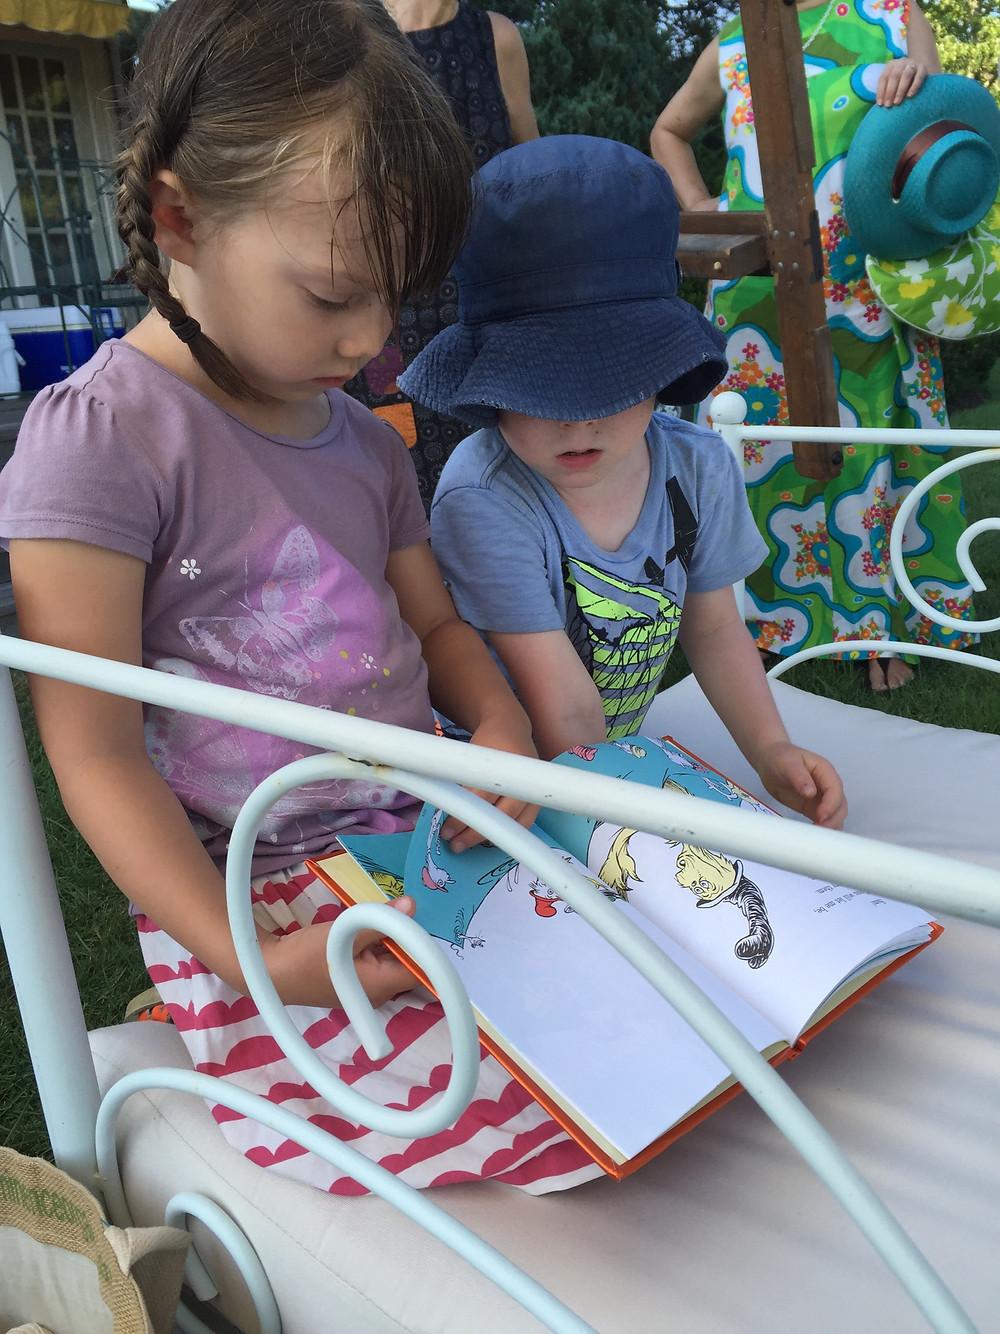 E V Starkey's son reading a book